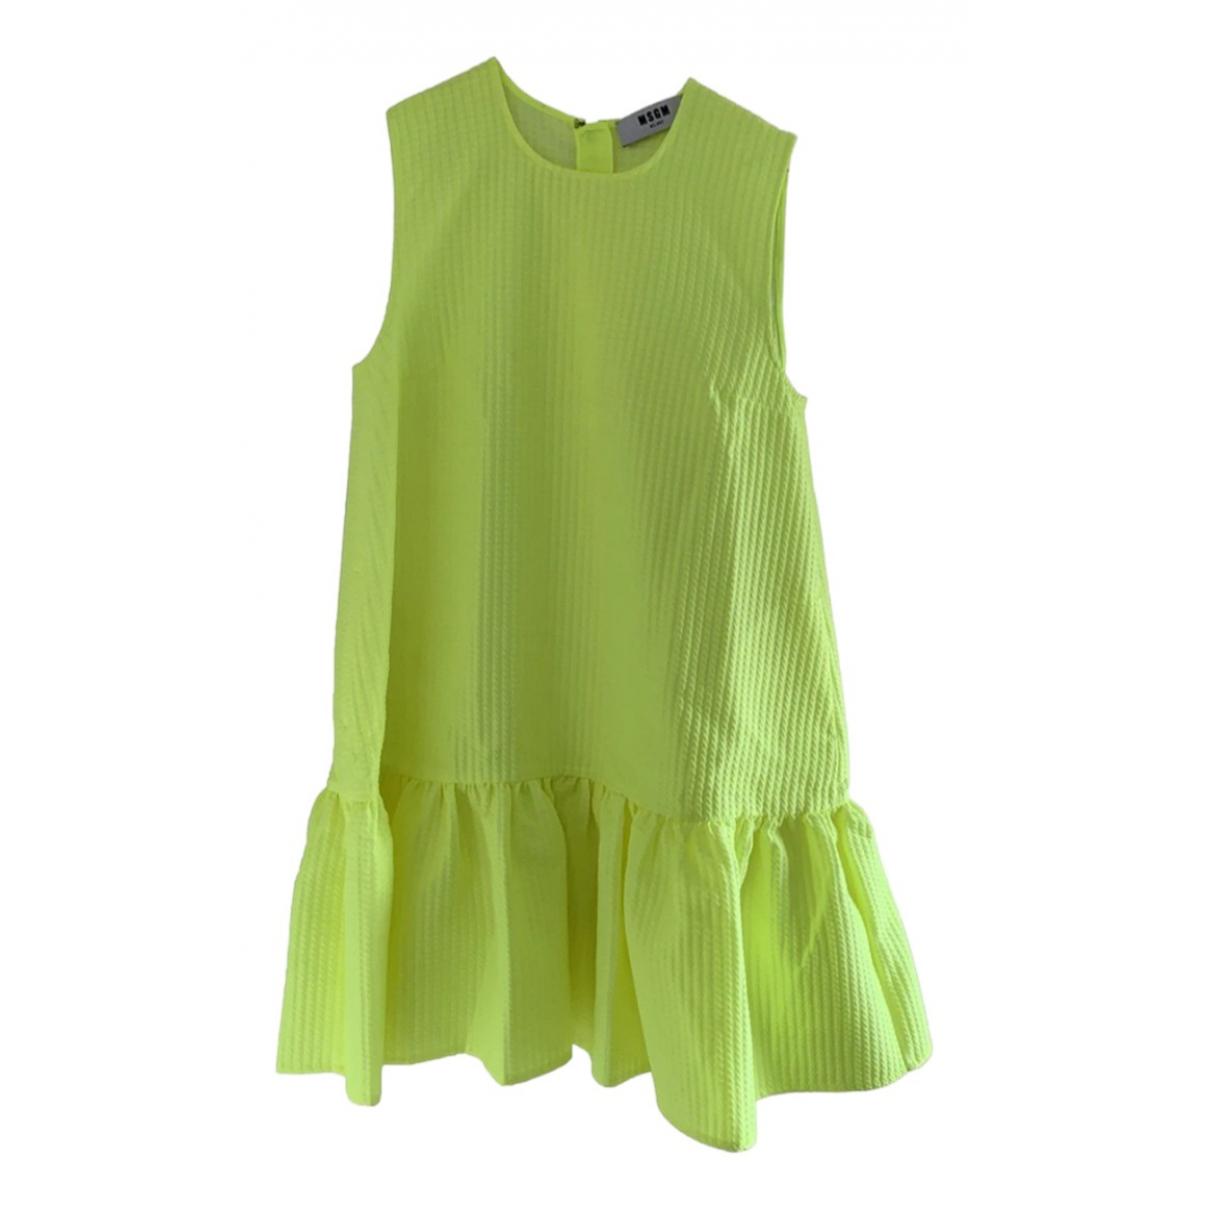 Msgm \N Kleid in  Gruen Polyester